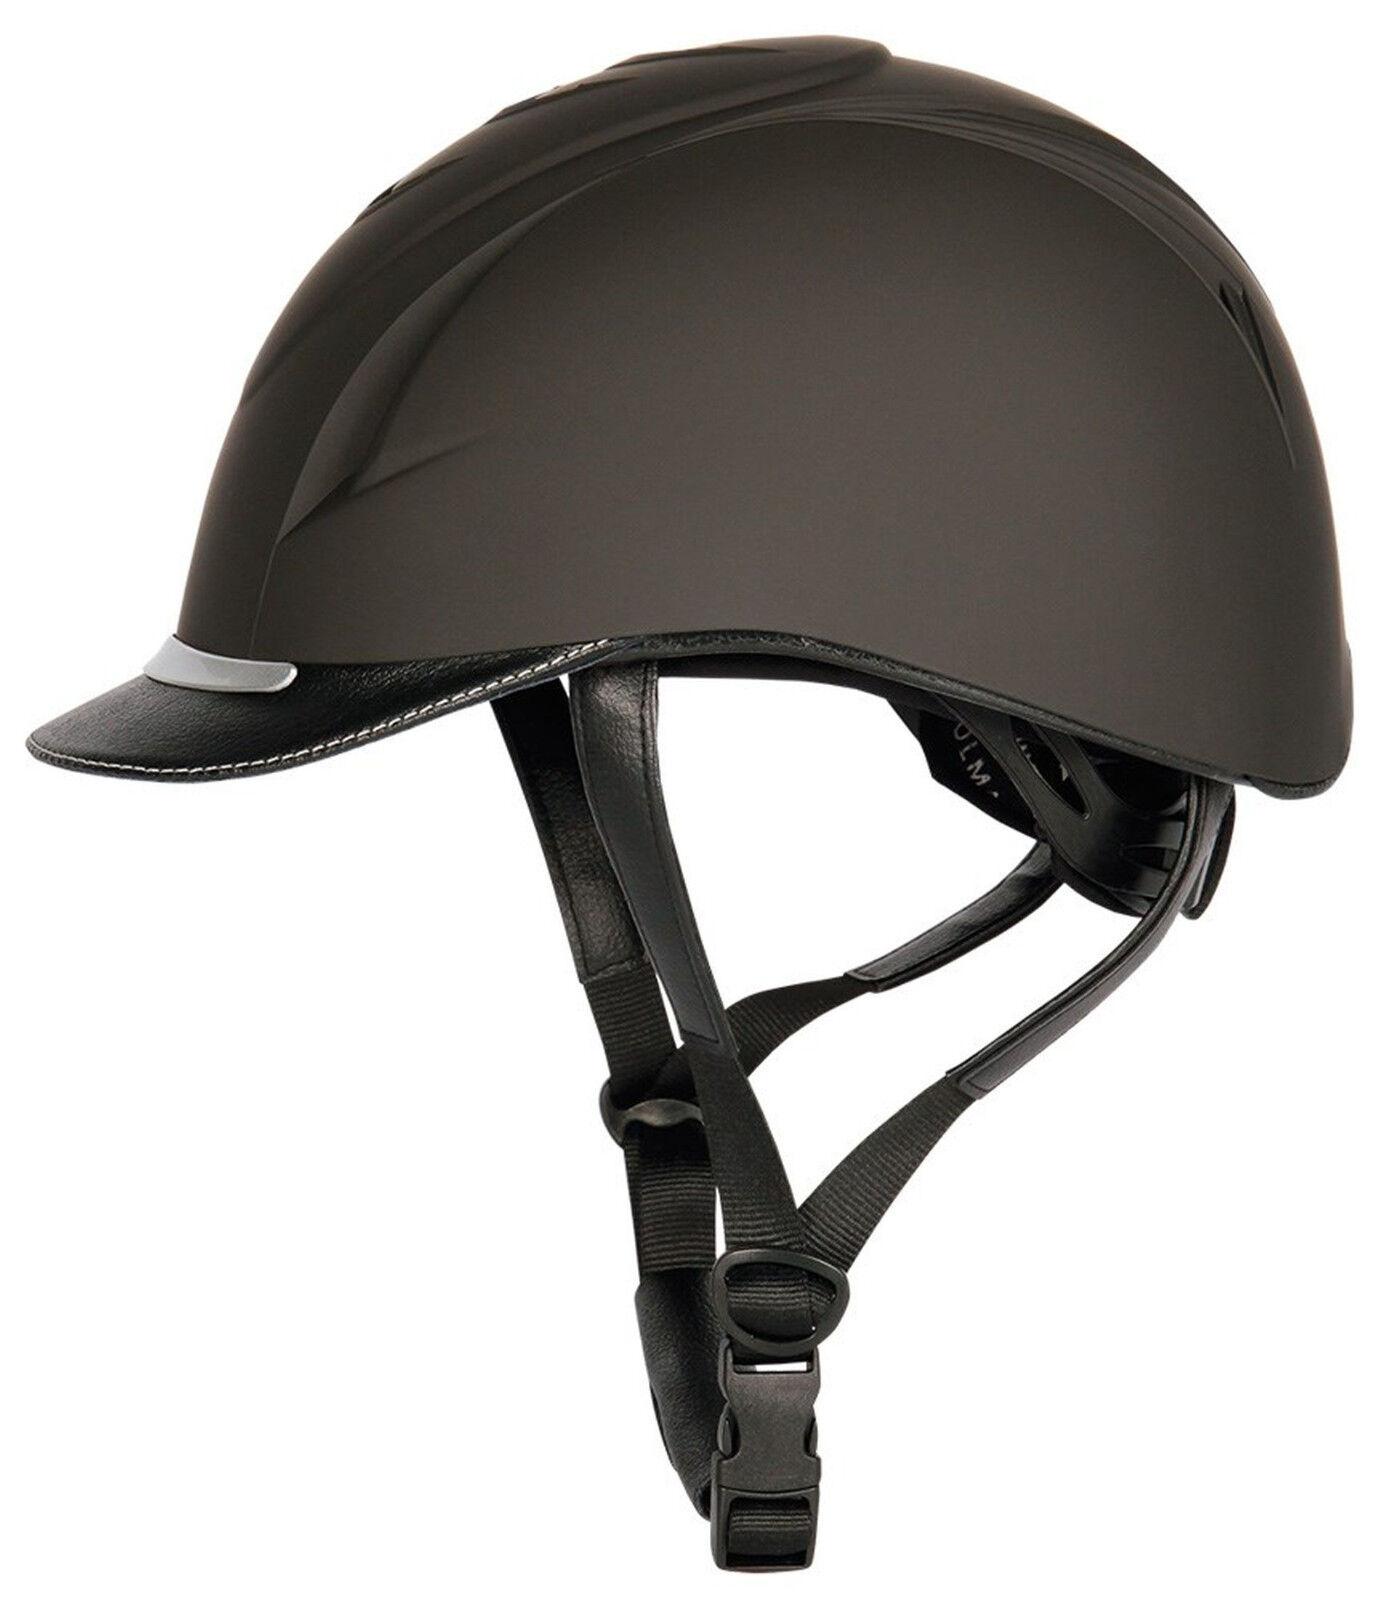 Harry's  Horse Sicherheits-Reithelm Challenge CE VG1 01 040 2014-12  Harry's  3 Farben a10a1e